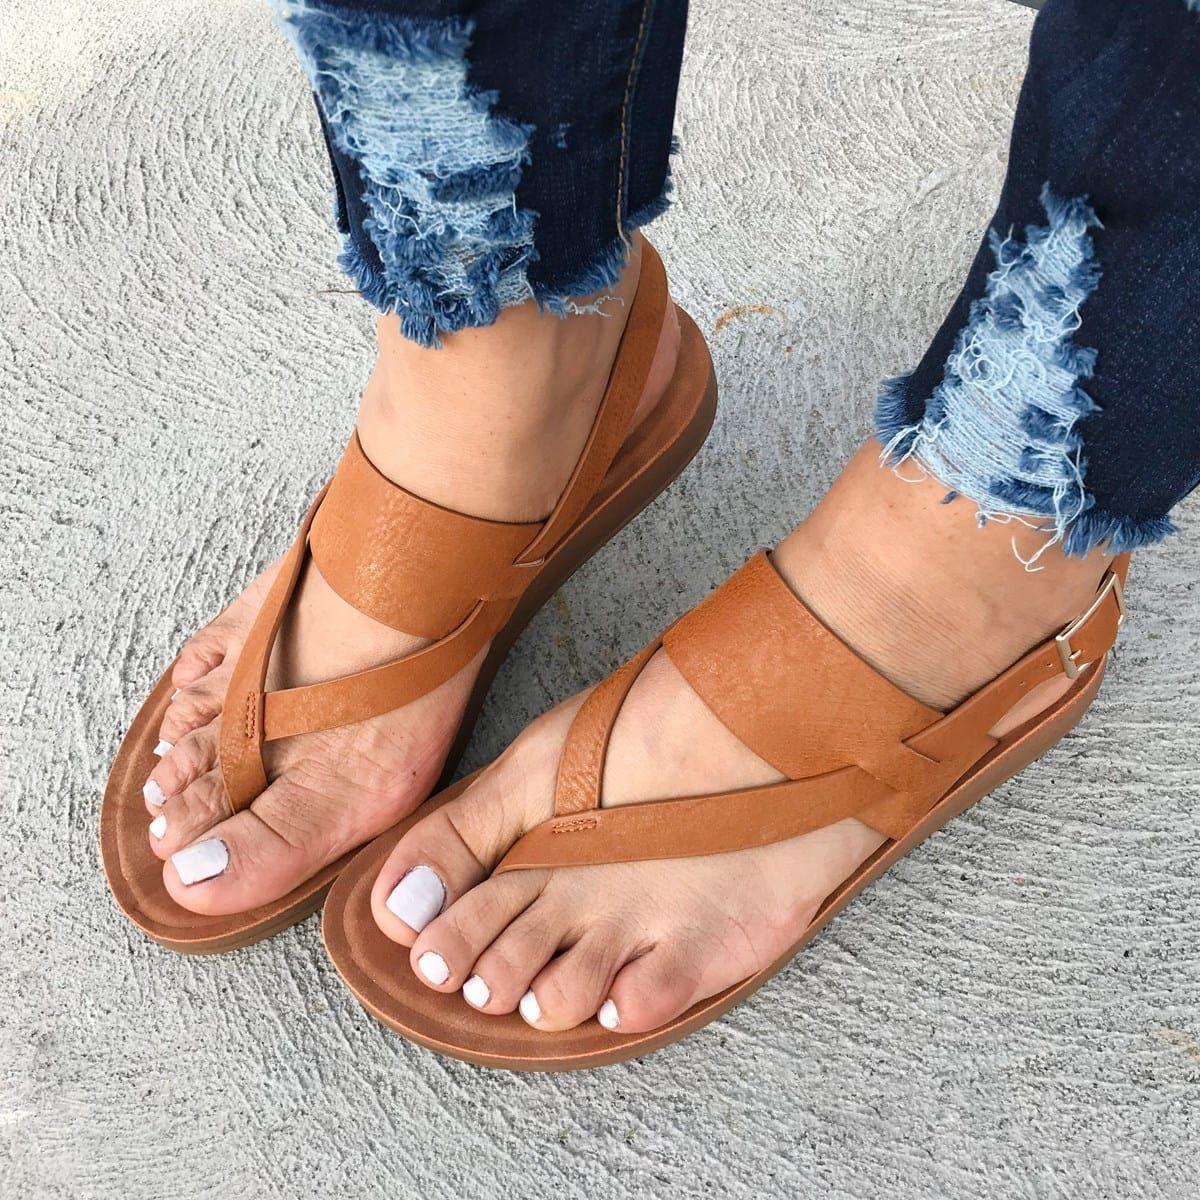 Cushion Sole Buckle Sandal In 2019 Shoes Sandals Shoes Flip